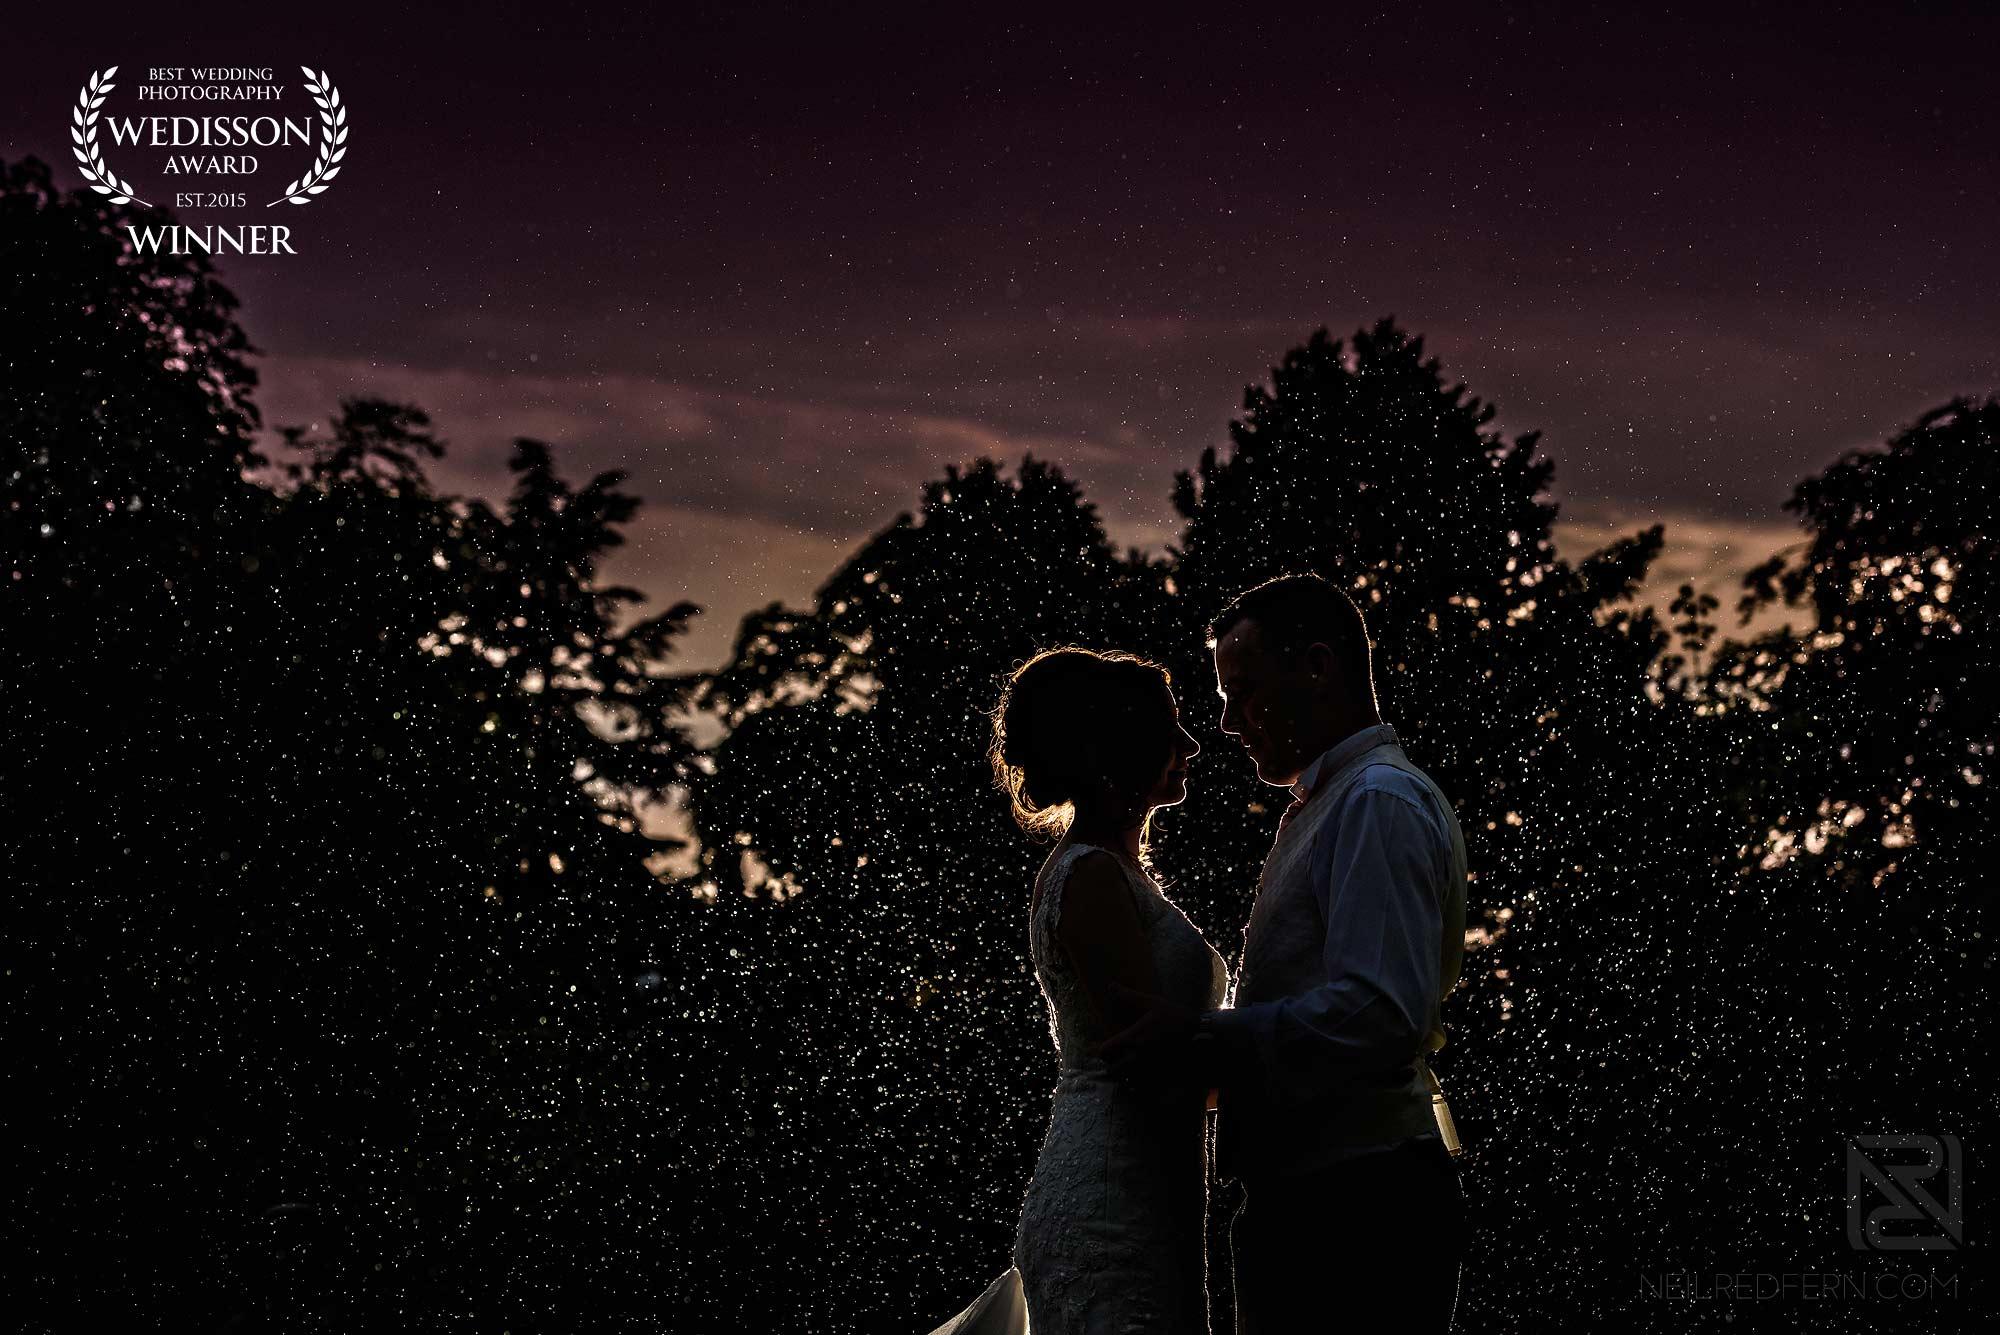 bride and groom in the rain - winner of a Wedisson award